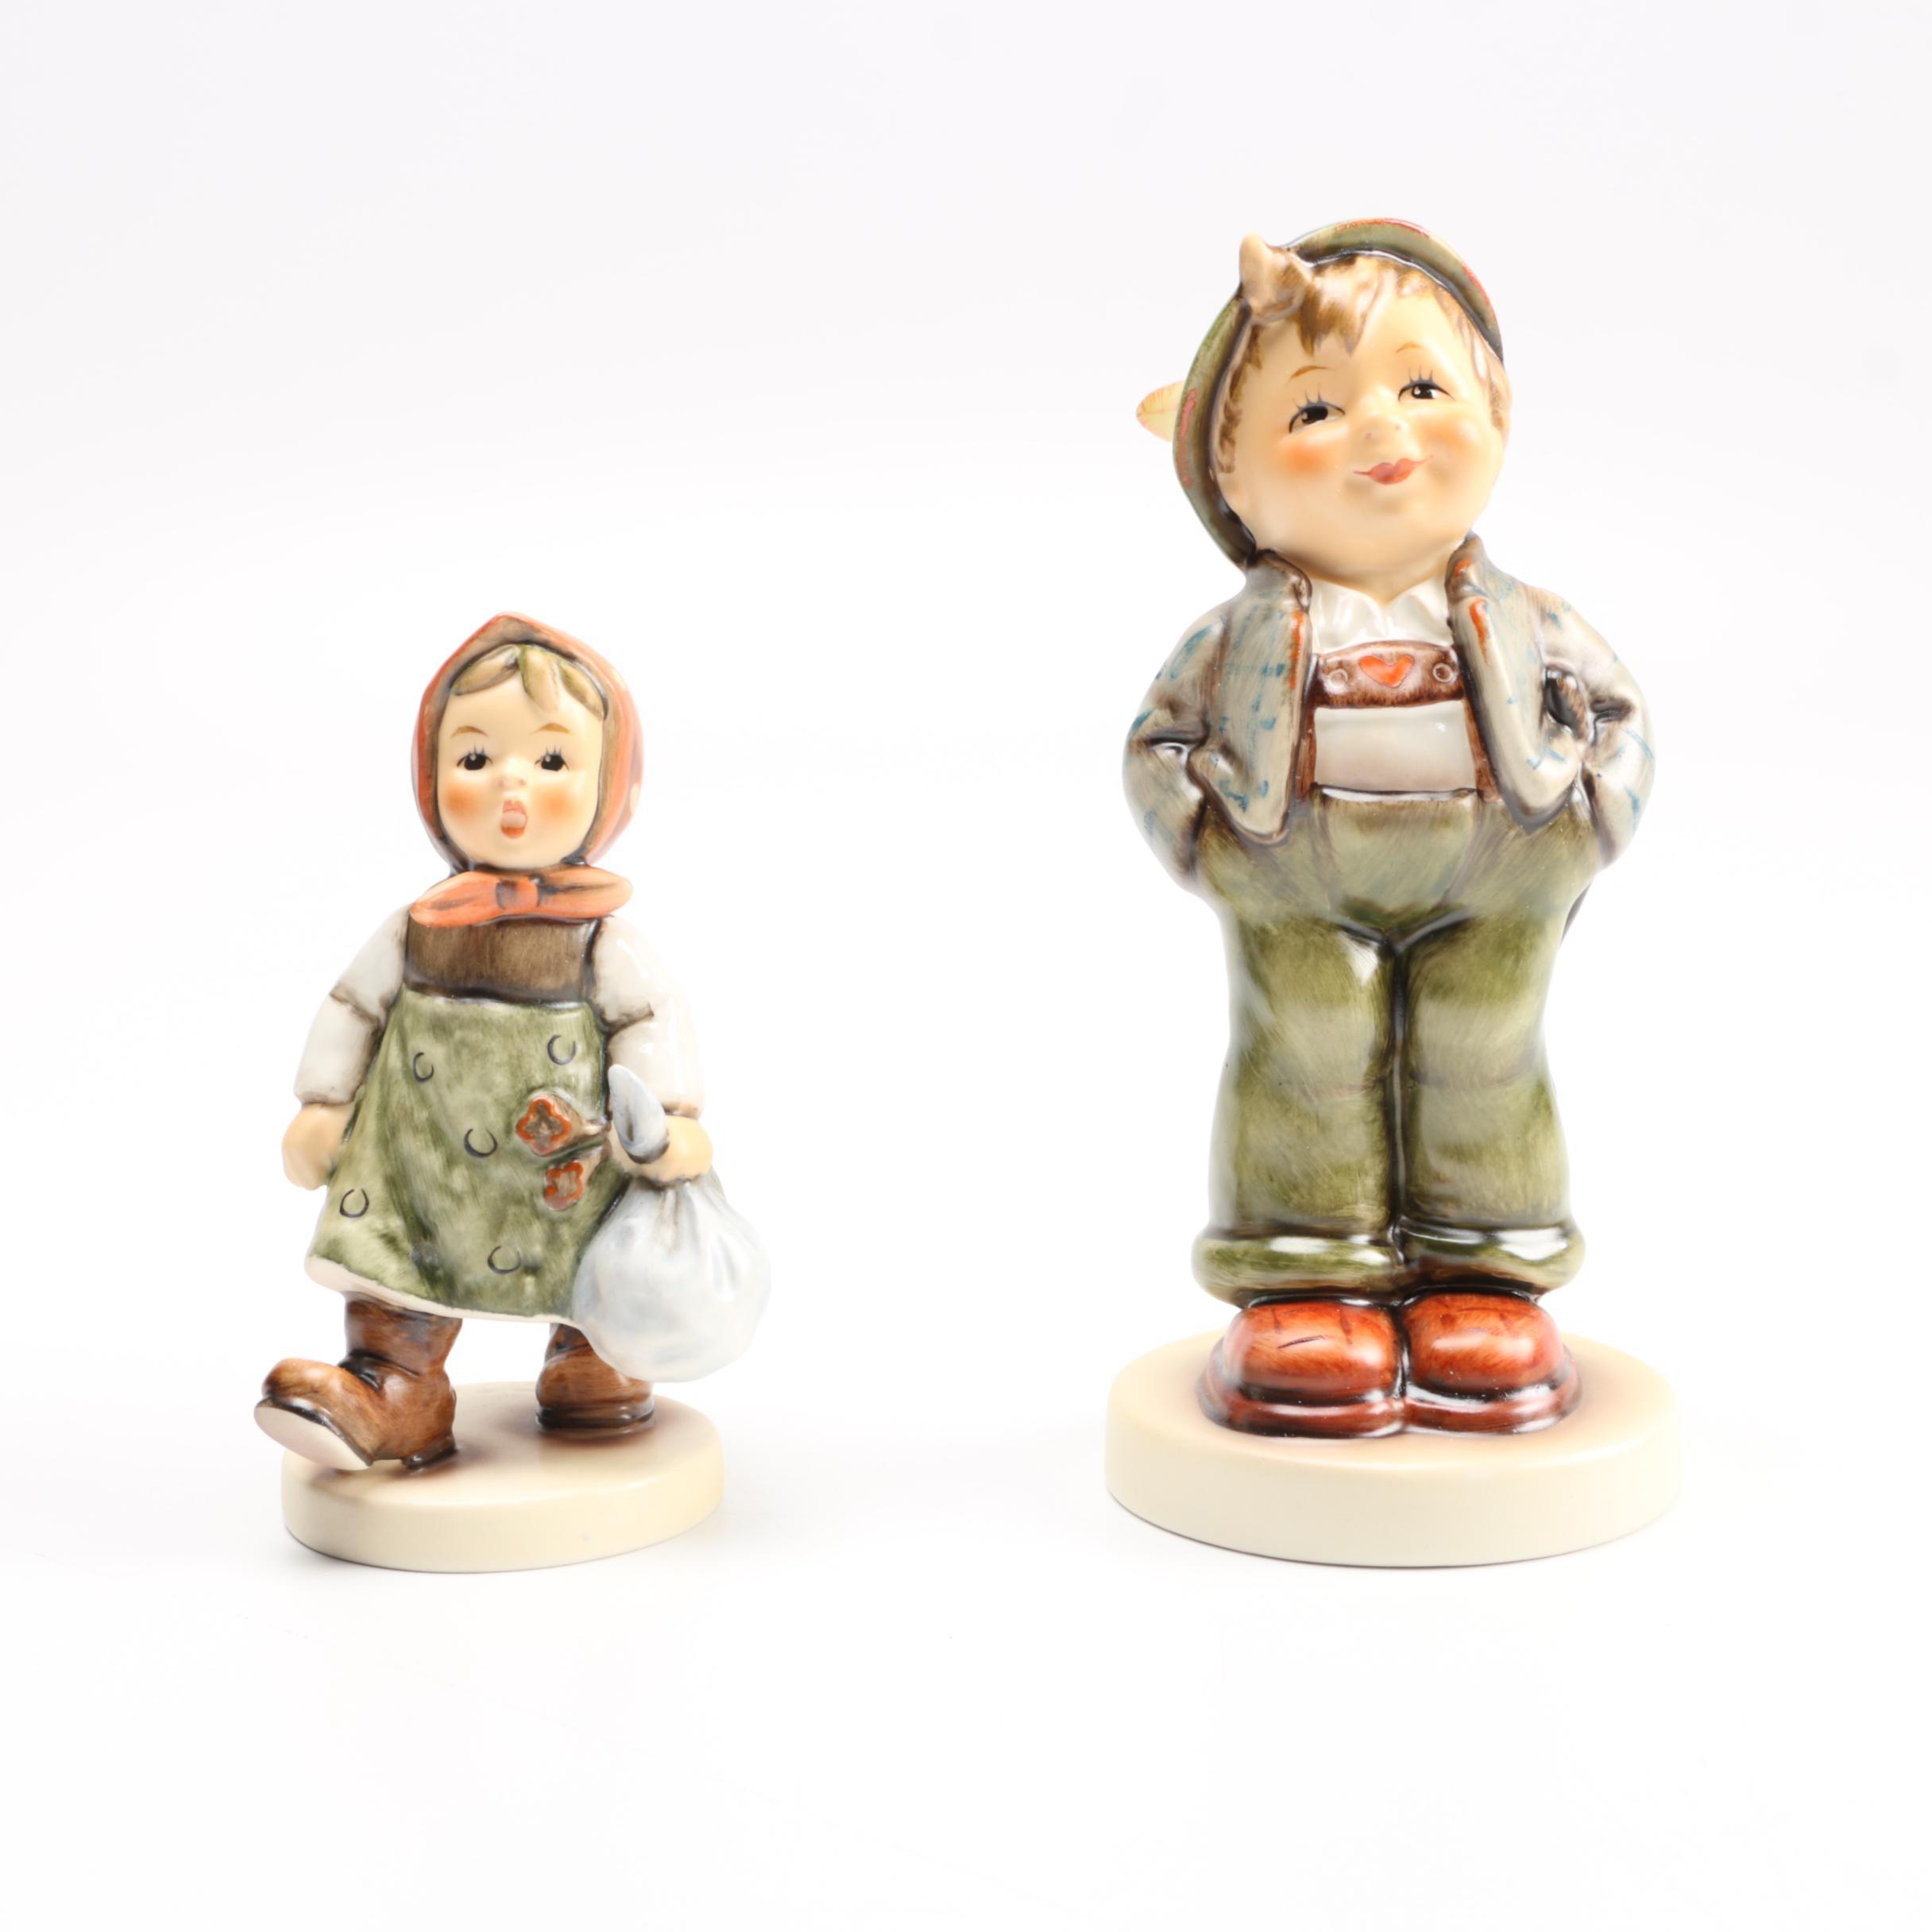 "Hummel Figurines Exclusive Edition ""Hello World"" and ""Grandma's Girl"""